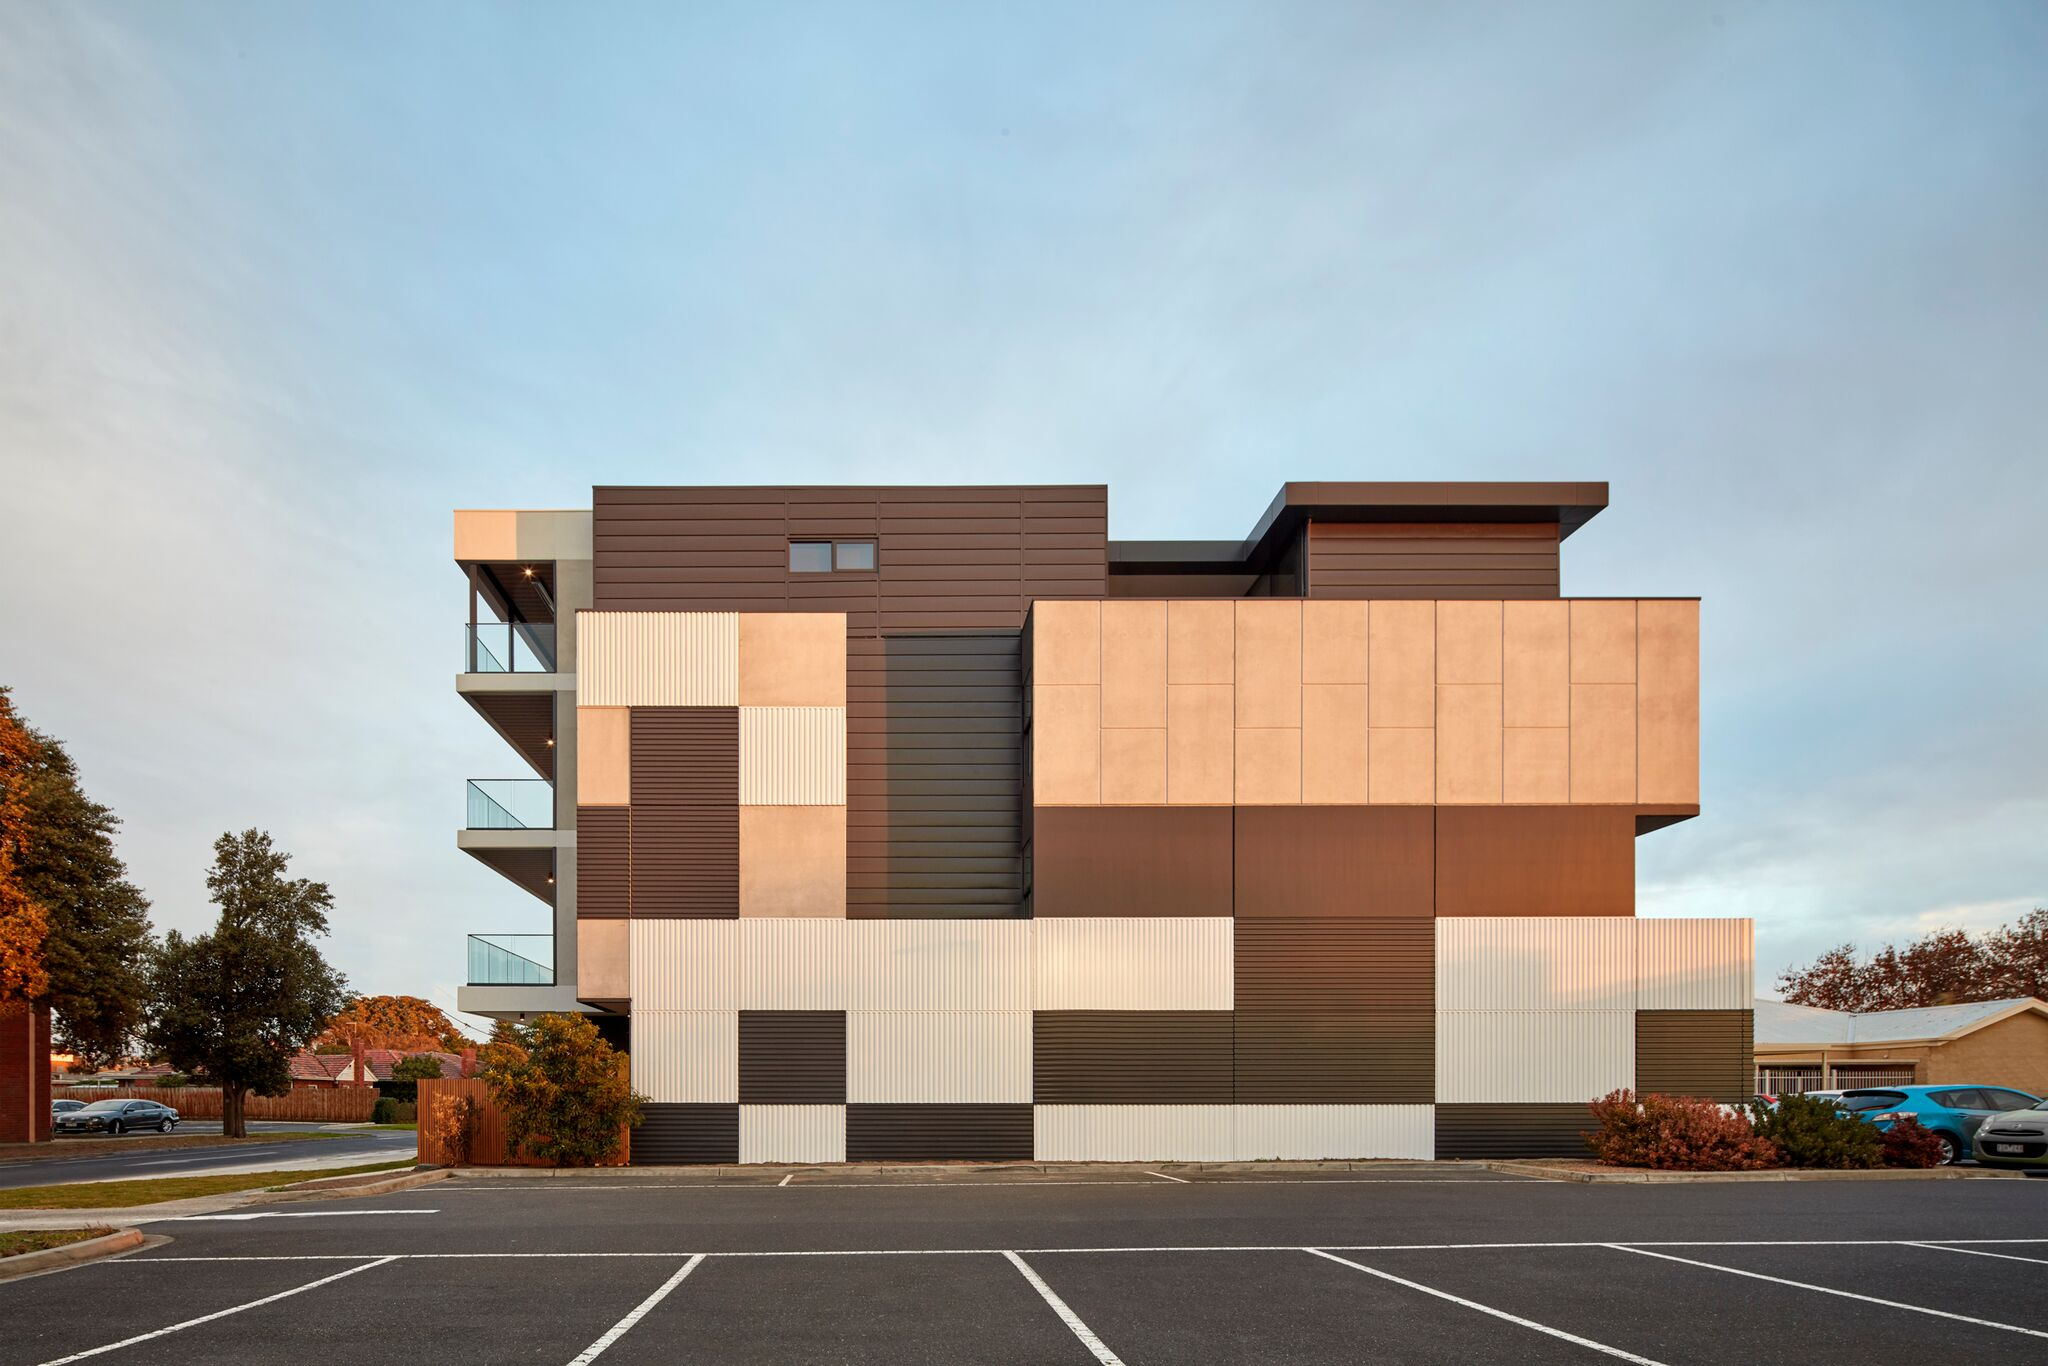 Gallery Of 33 35 Sargood Street By Mancini Made Local Australian Architecture & Interior Design Altona, Vic Image 2